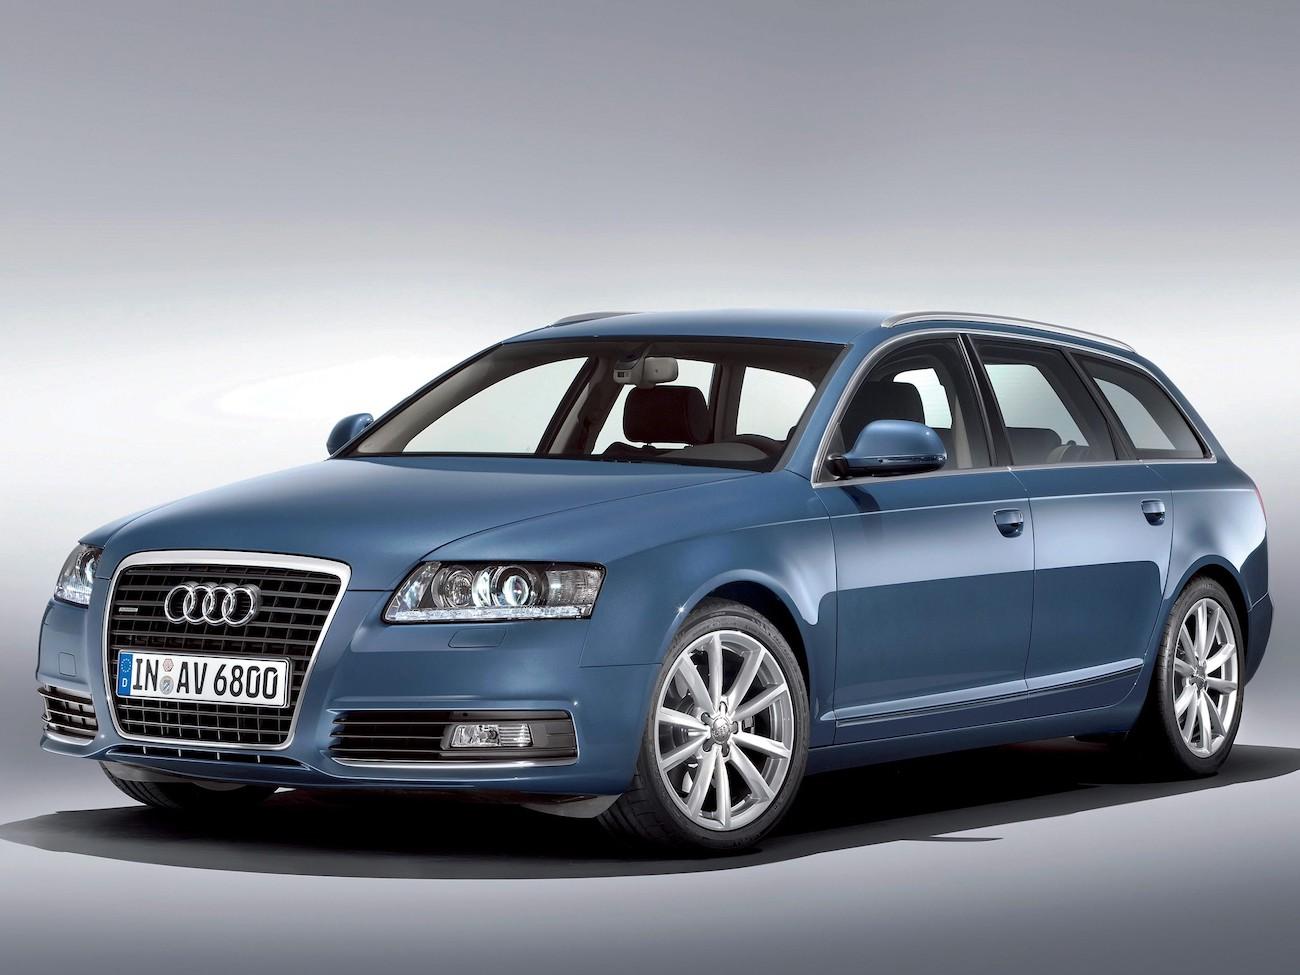 Tuto-vidange-6HP19-Audi-A6-C6-1.jpg